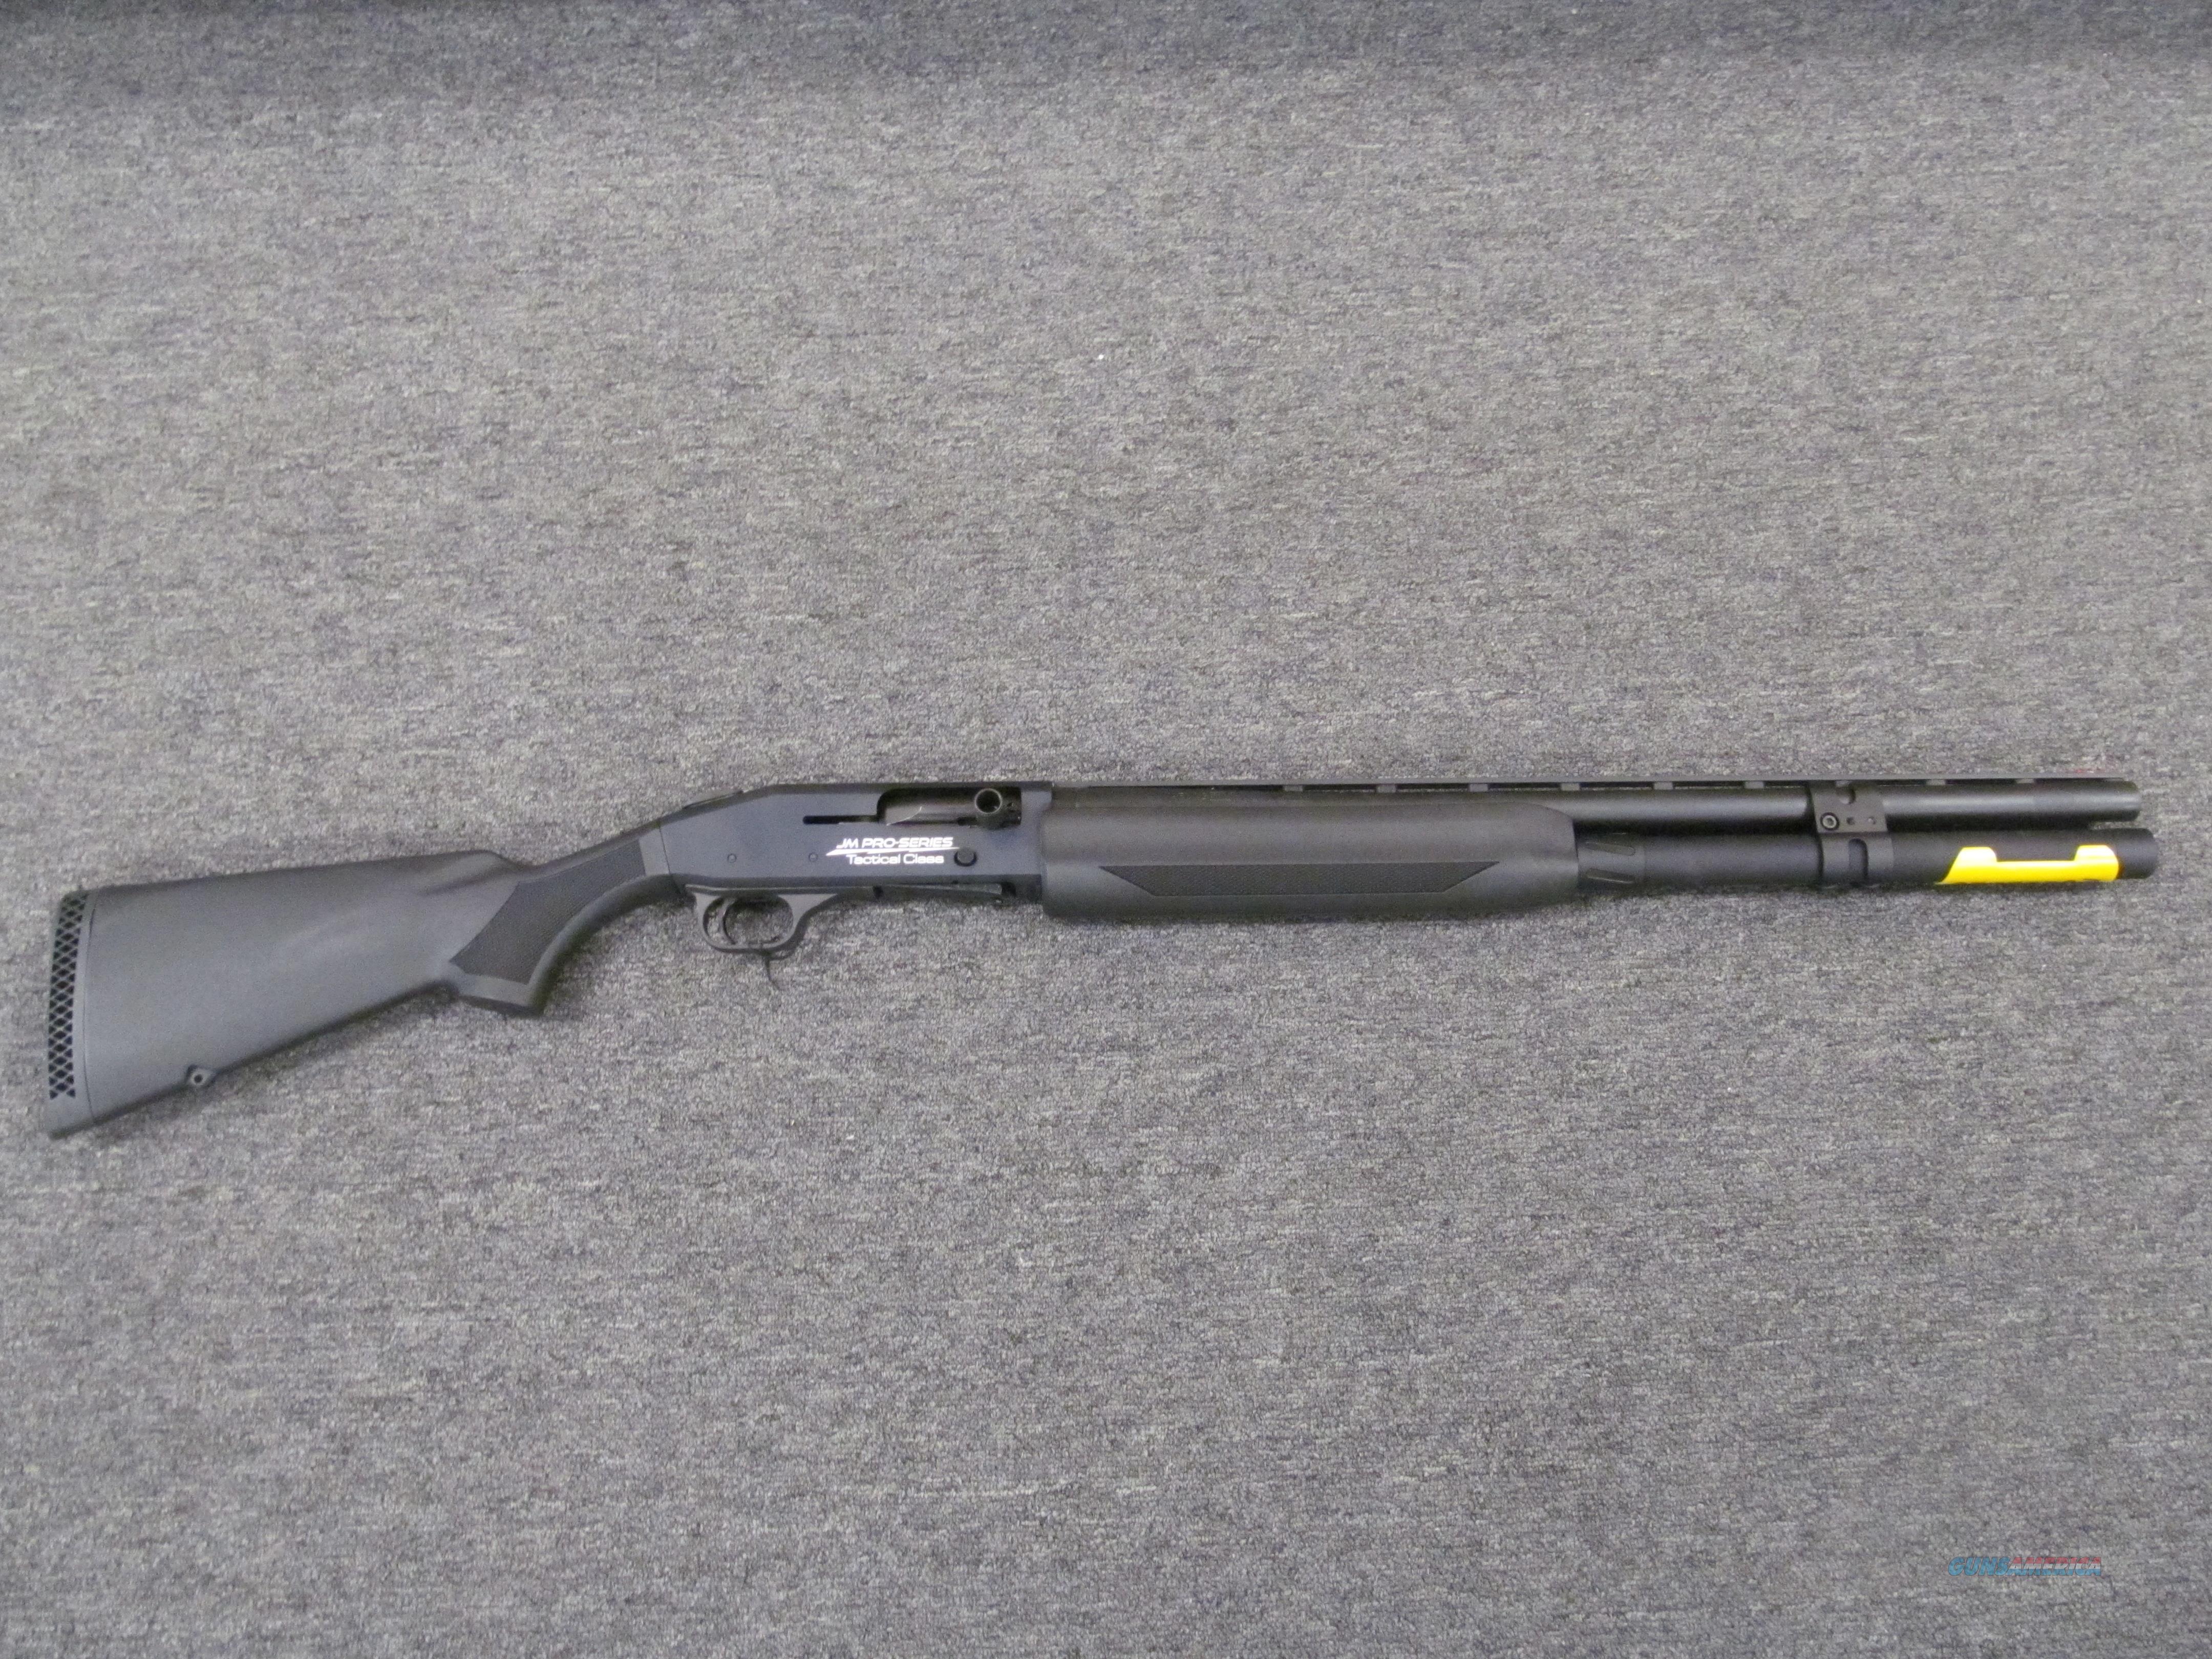 Mossberg 930 JM Pro Series Tactical Class (85118)  Guns > Shotguns > Mossberg Shotguns > Autoloaders